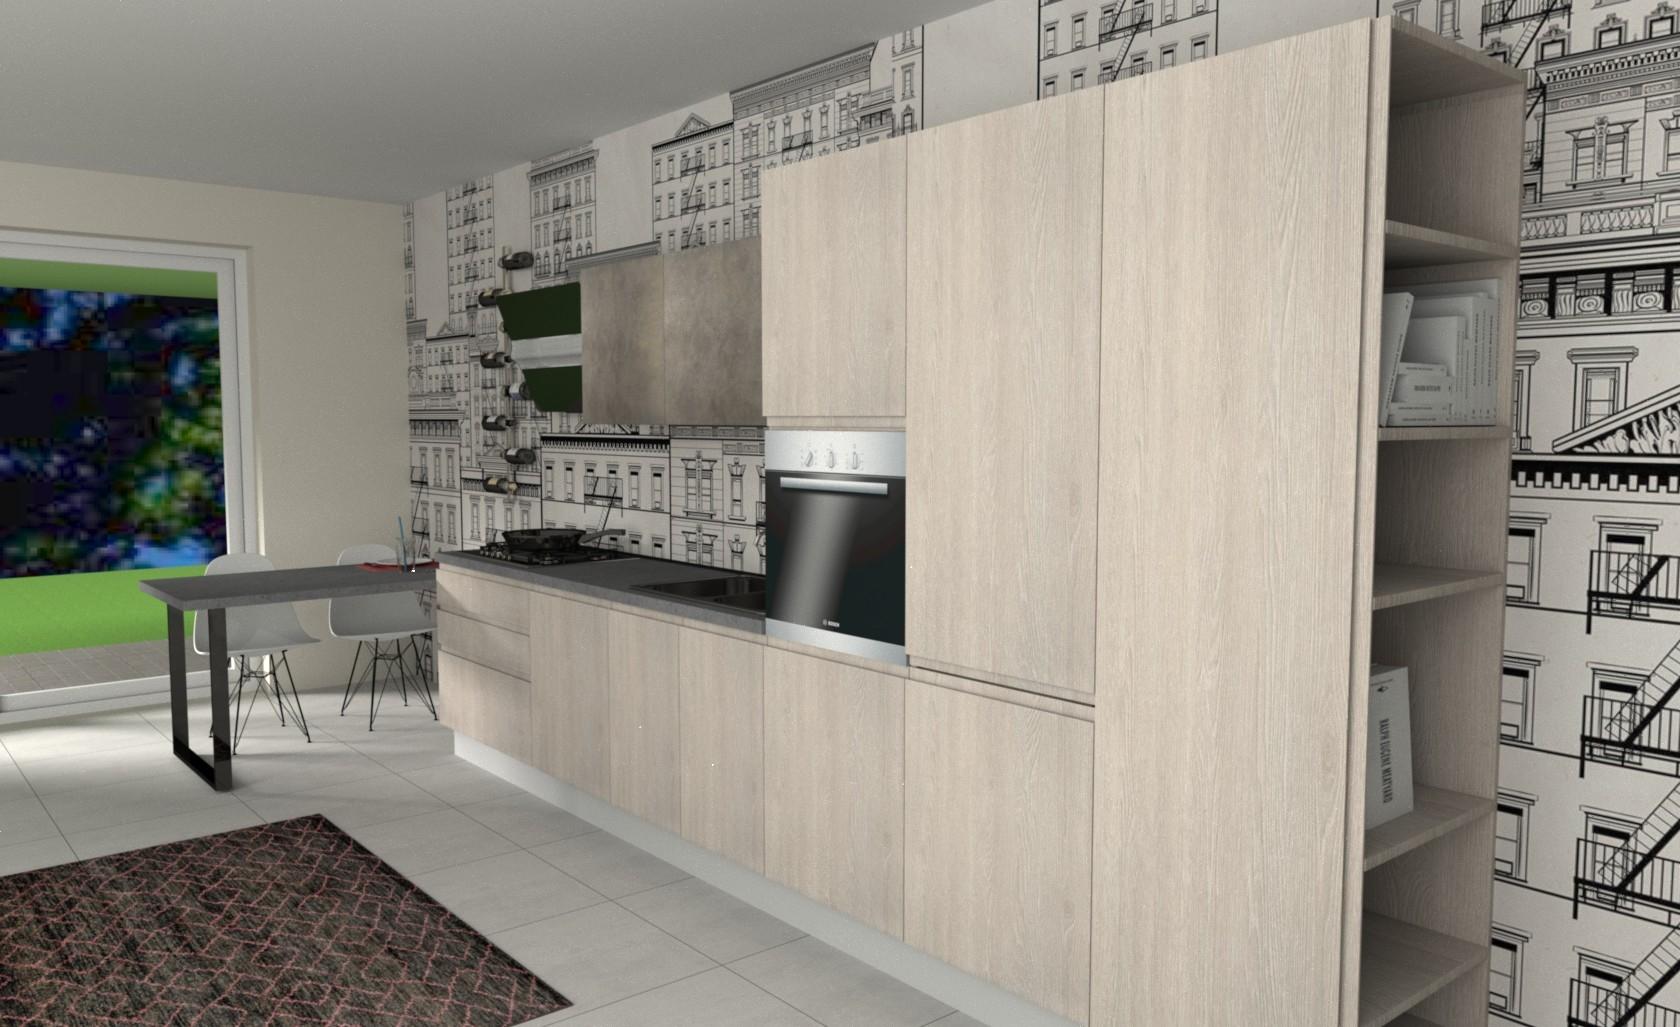 Cucina berloni prezzi cheap cucina moderna con penisola - Prezzi cucine berloni ...